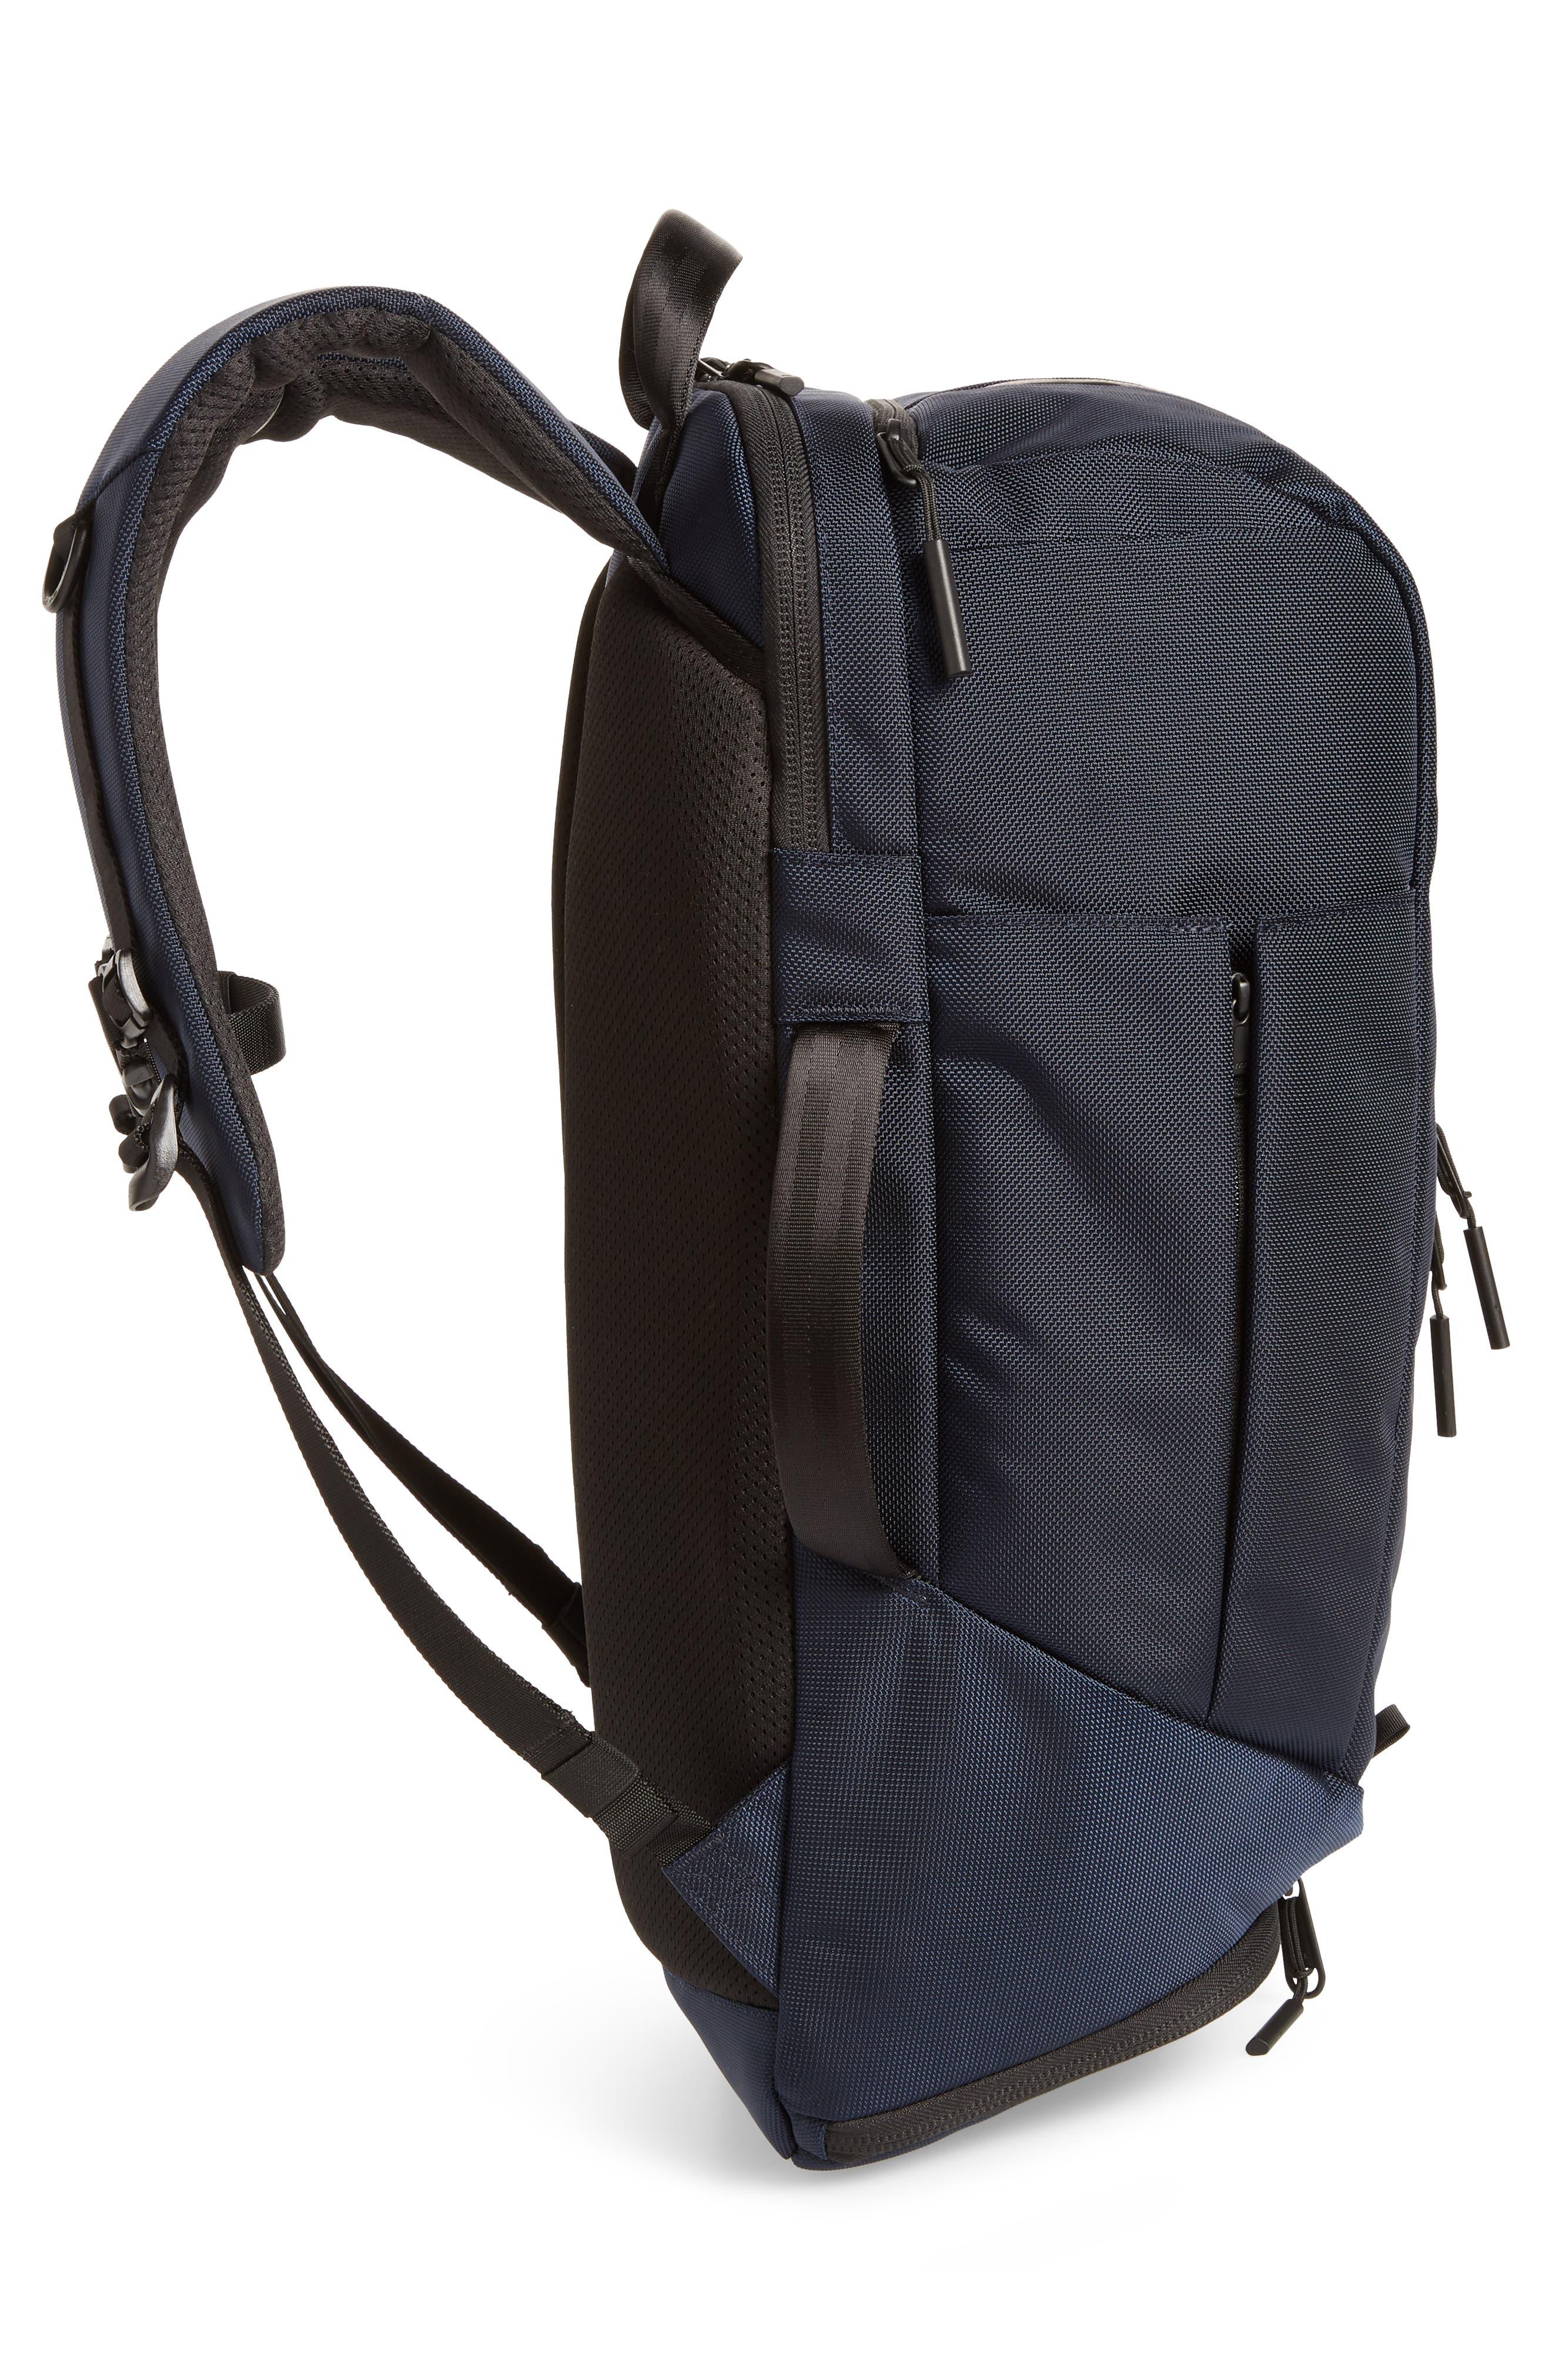 Duffel Pack 2 Convertible Backpack,                             Alternate thumbnail 4, color,                             Navy